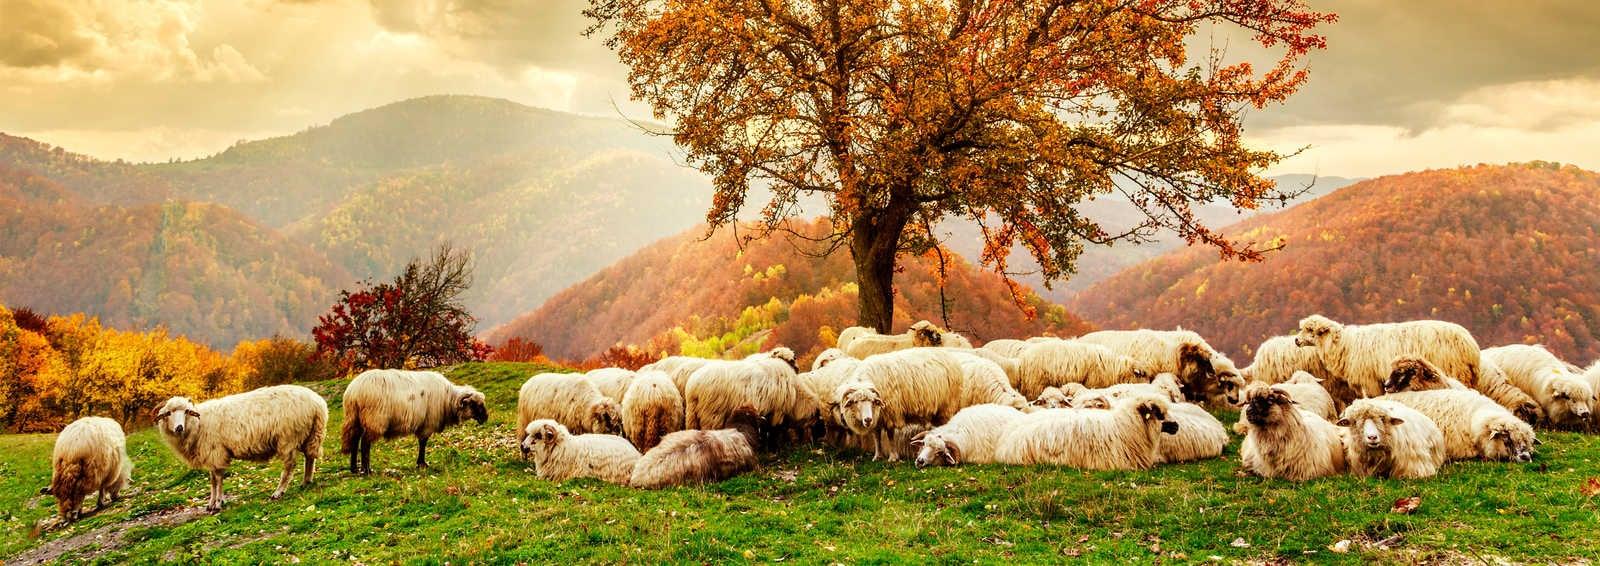 Flock of sheep in the Carpathian Mountains, Romania